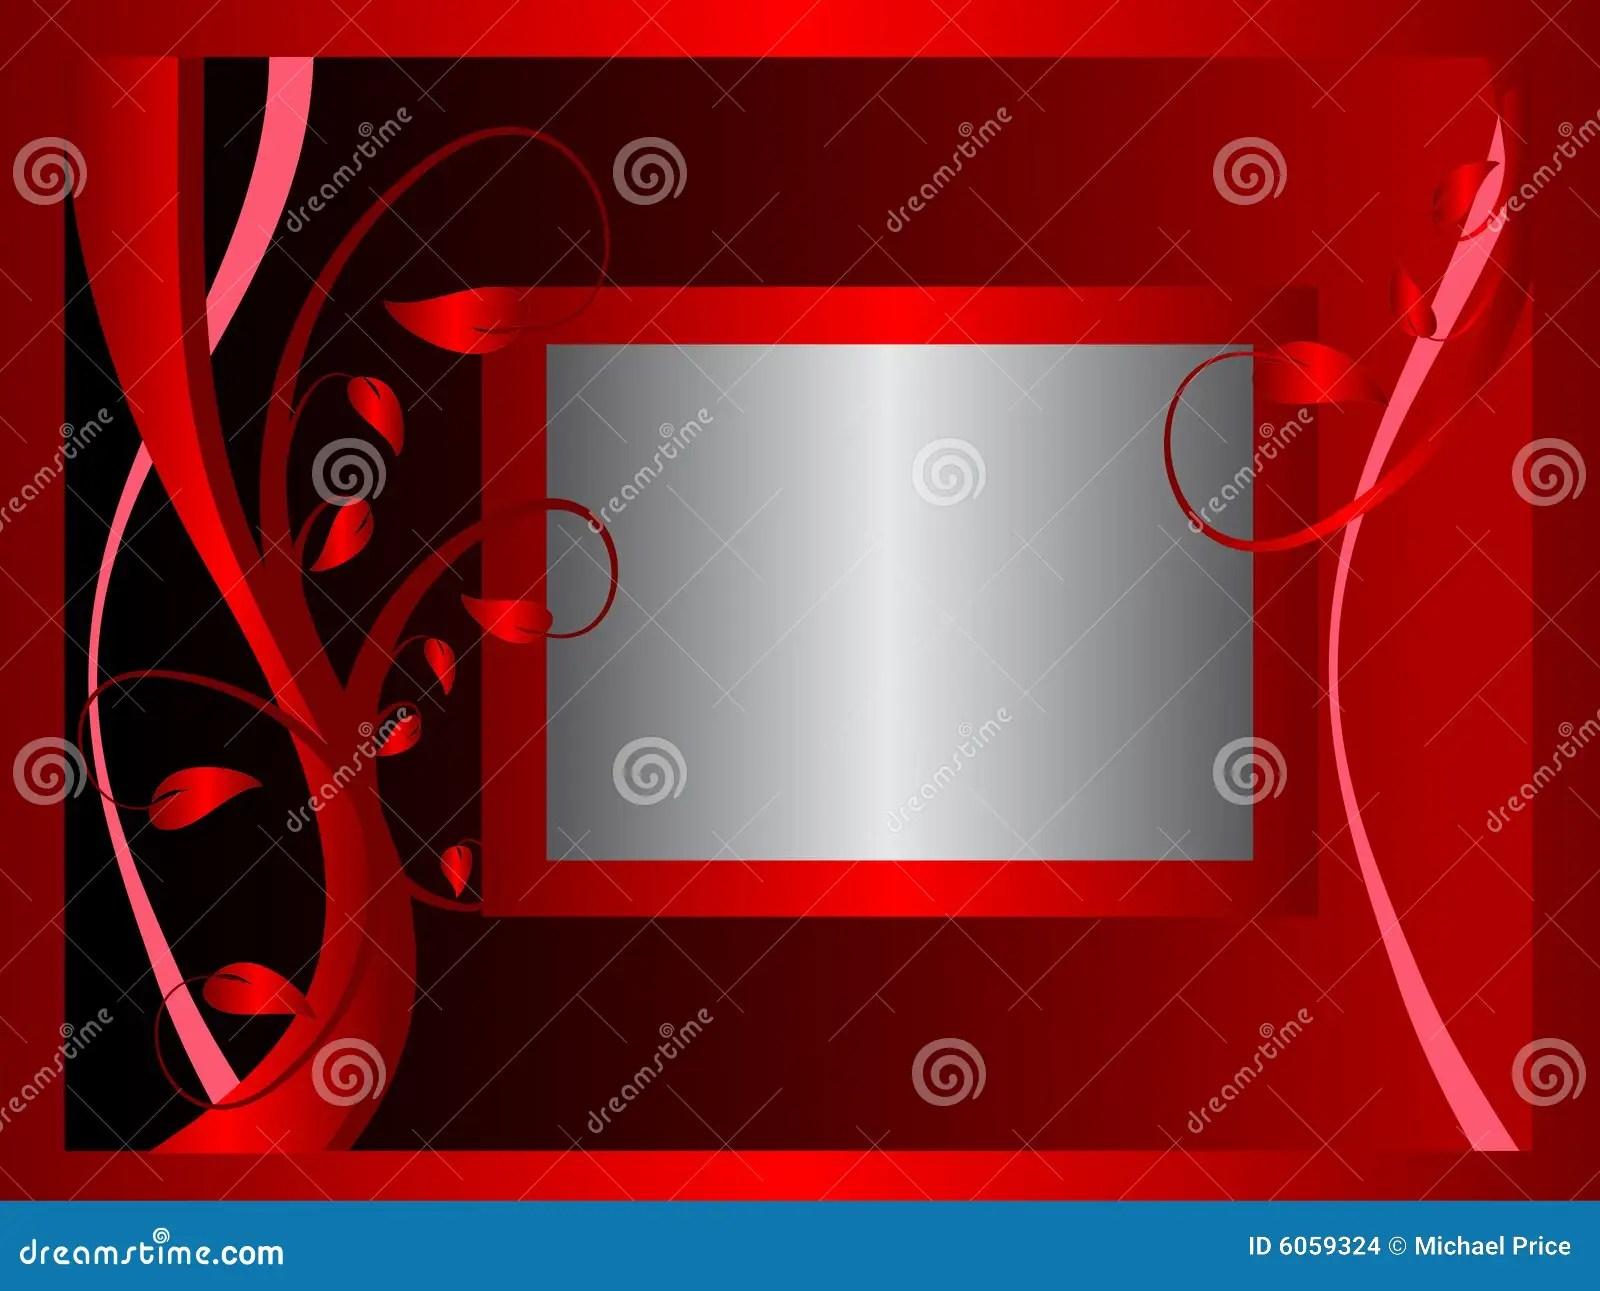 3d Metallic Wallpaper Formal Red Floral Background Stock Images Image 6059324